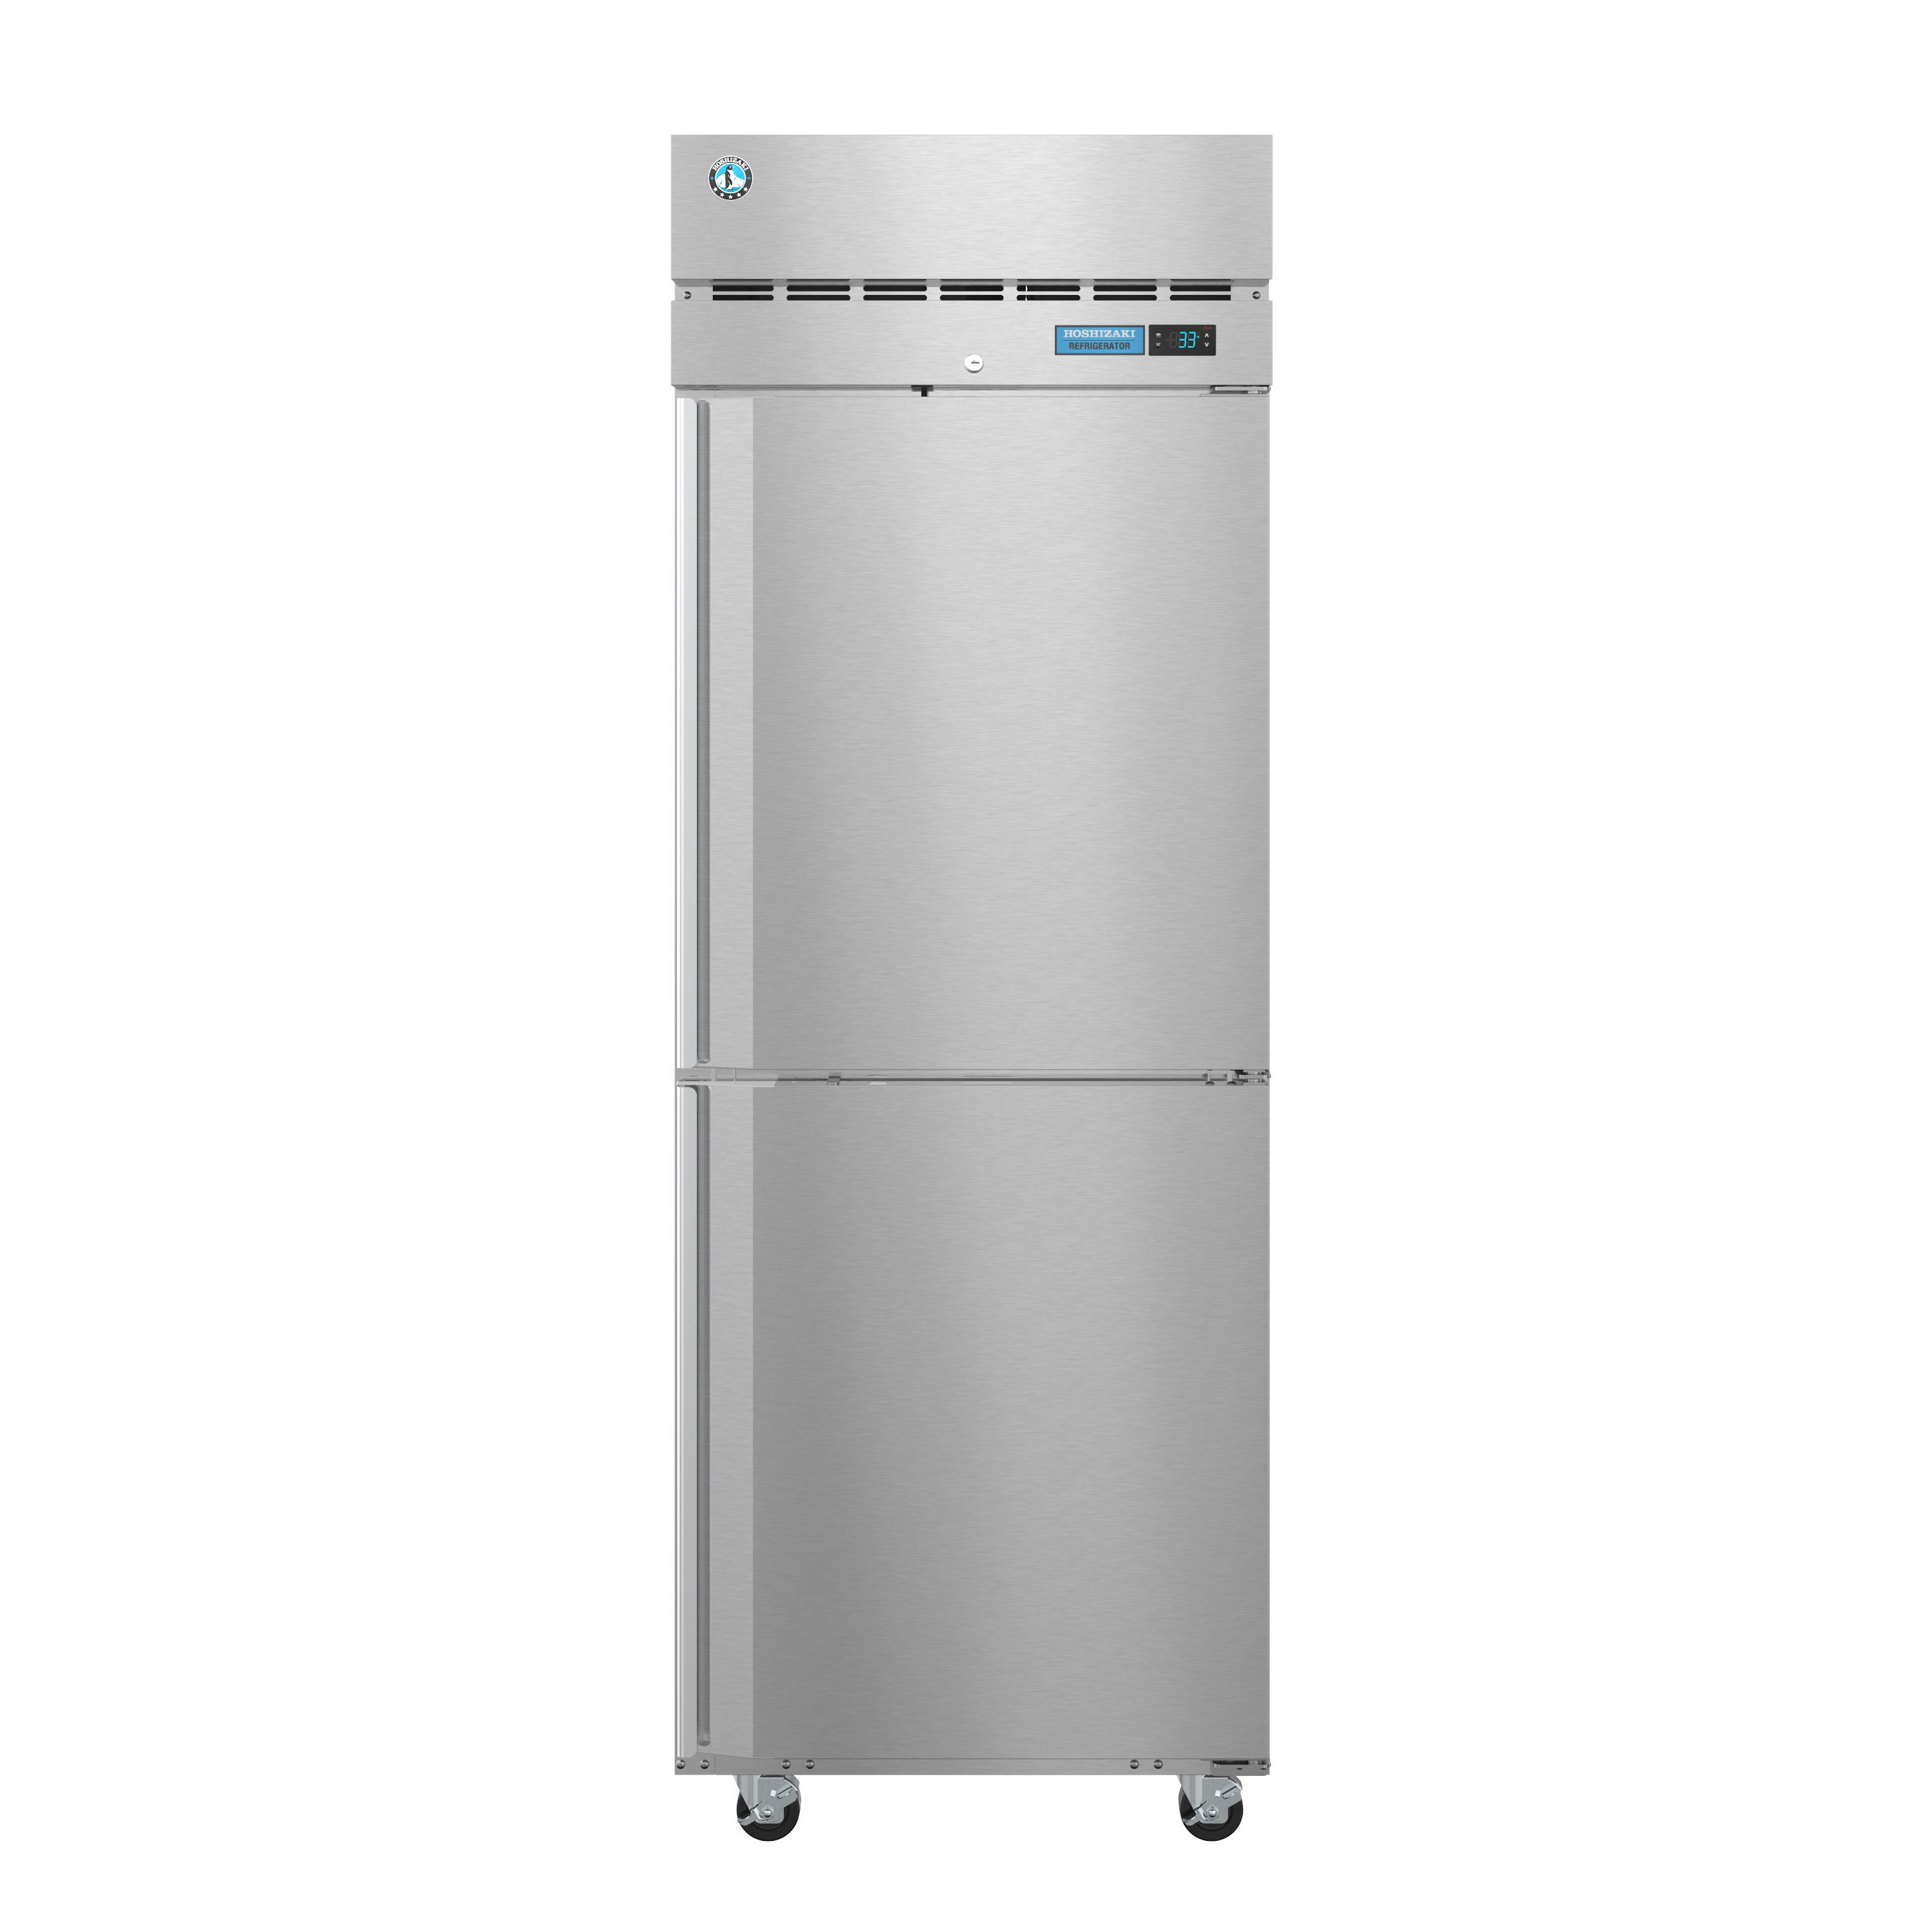 Hoshizaki R1A-HS reach-in refrigerators & freezers